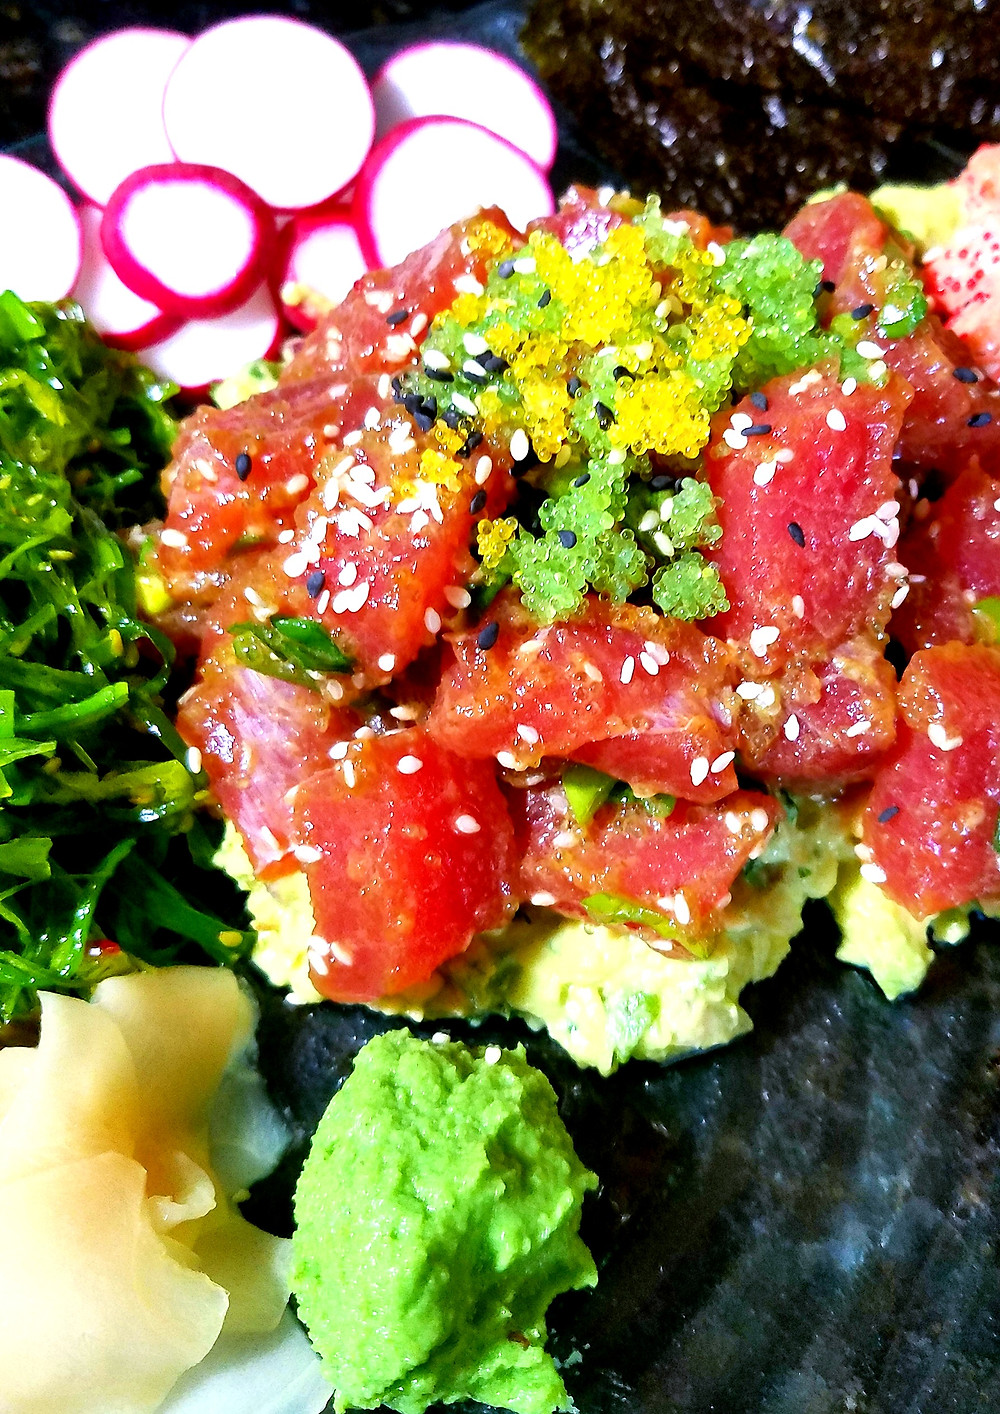 Spicy Tuna Poke Salad (Gluten-free, soy-free, dairy-free, grain-free)